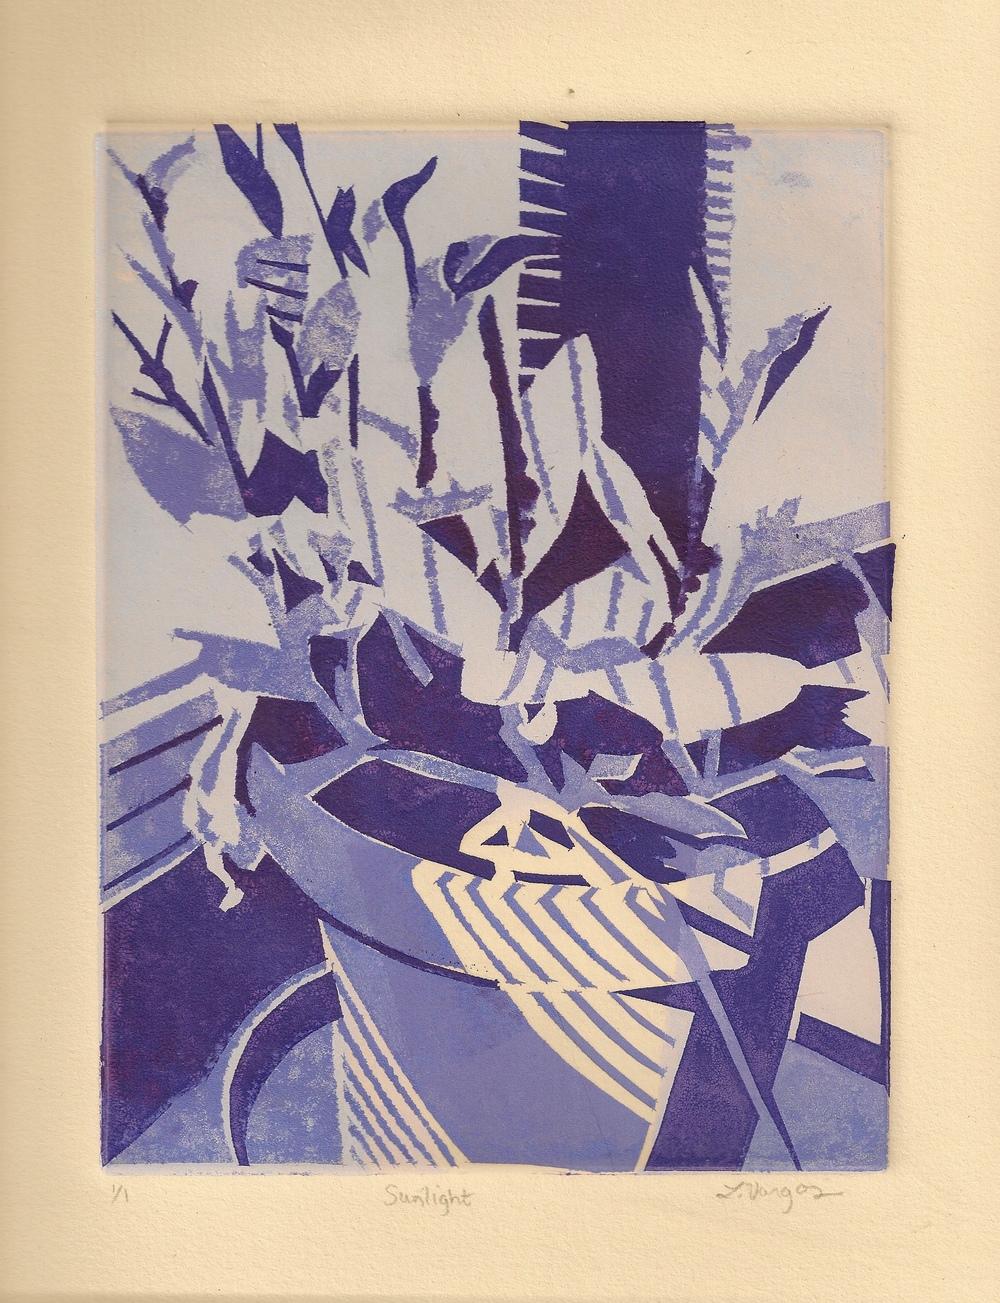 "Sunlight, 6x7 7/8"", monotype, 2010"